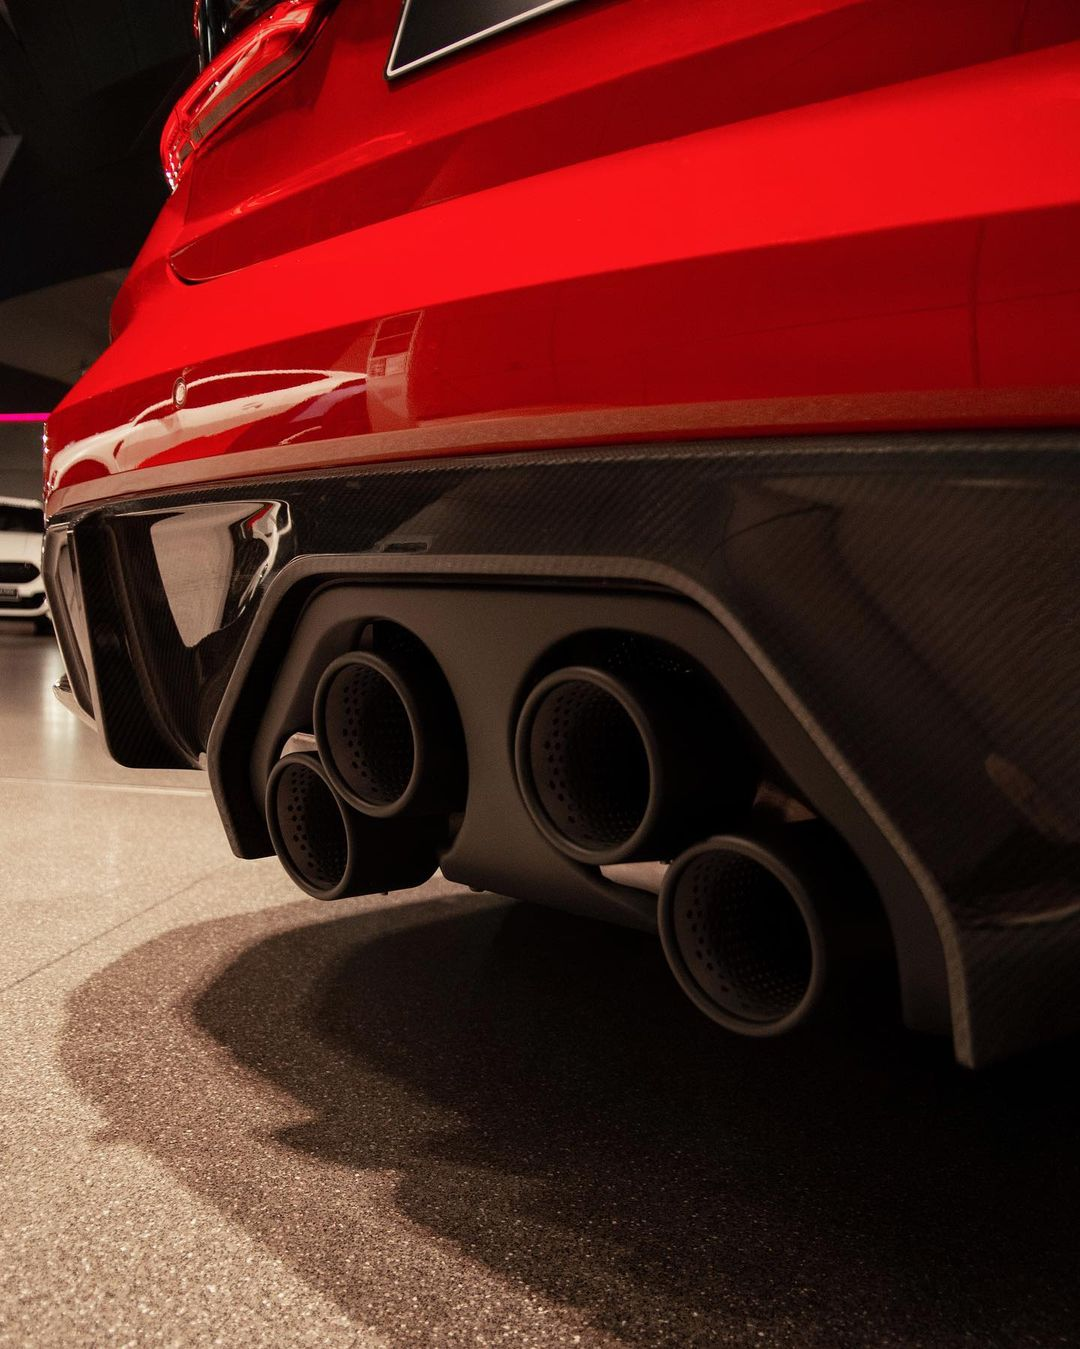 Name:  Toronto Red G80 M3 M Performance Parts 3.jpg Views: 10579 Size:  176.7 KB